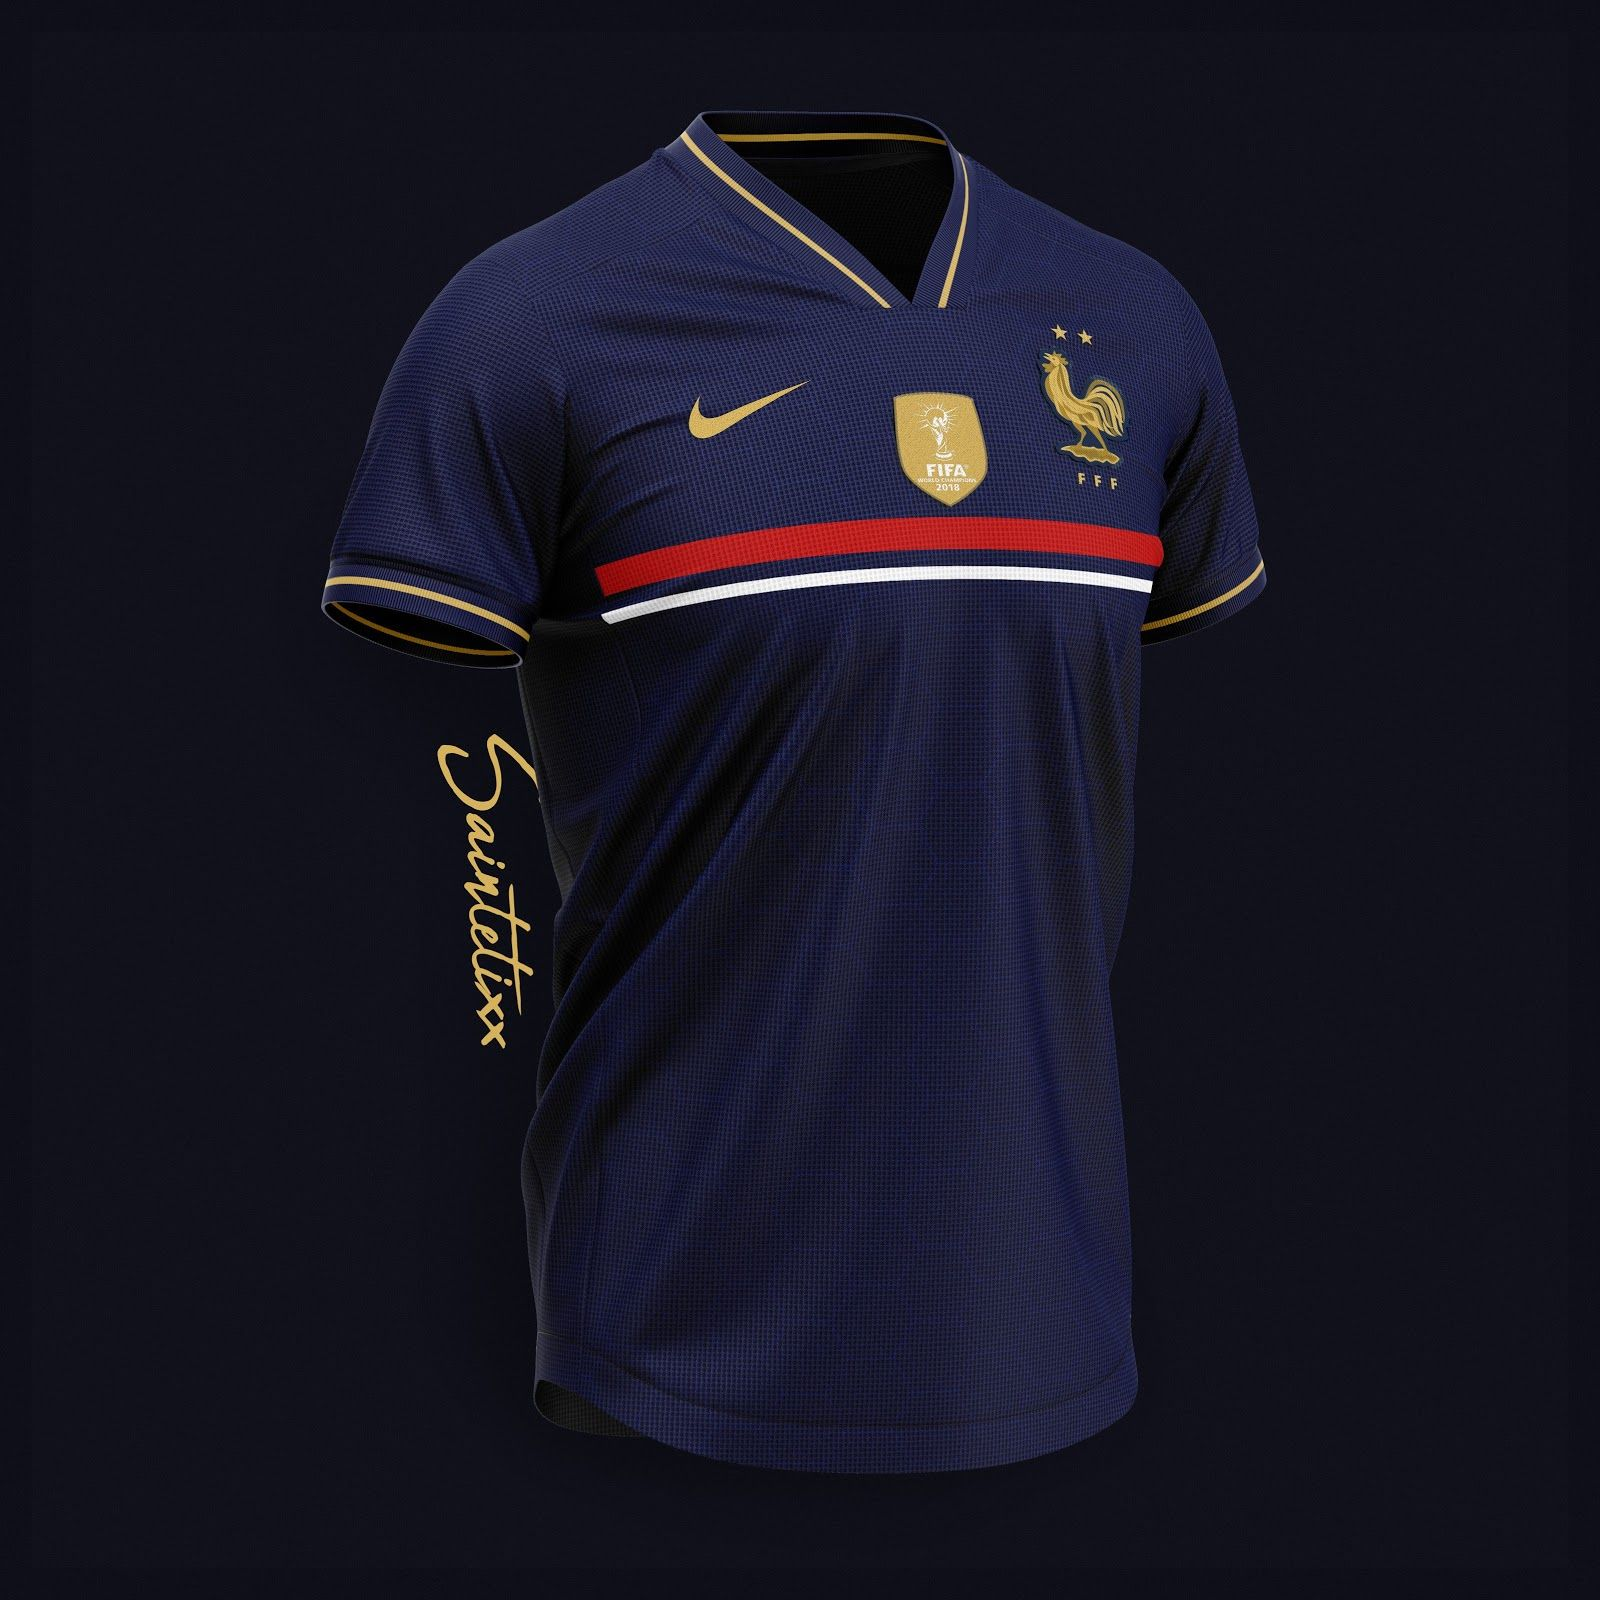 Stunning Nike France 2019 Concept Kits By Saintetixx Footy Headlines Sports Jersey Design Sports Uniform Design France Football Shirt